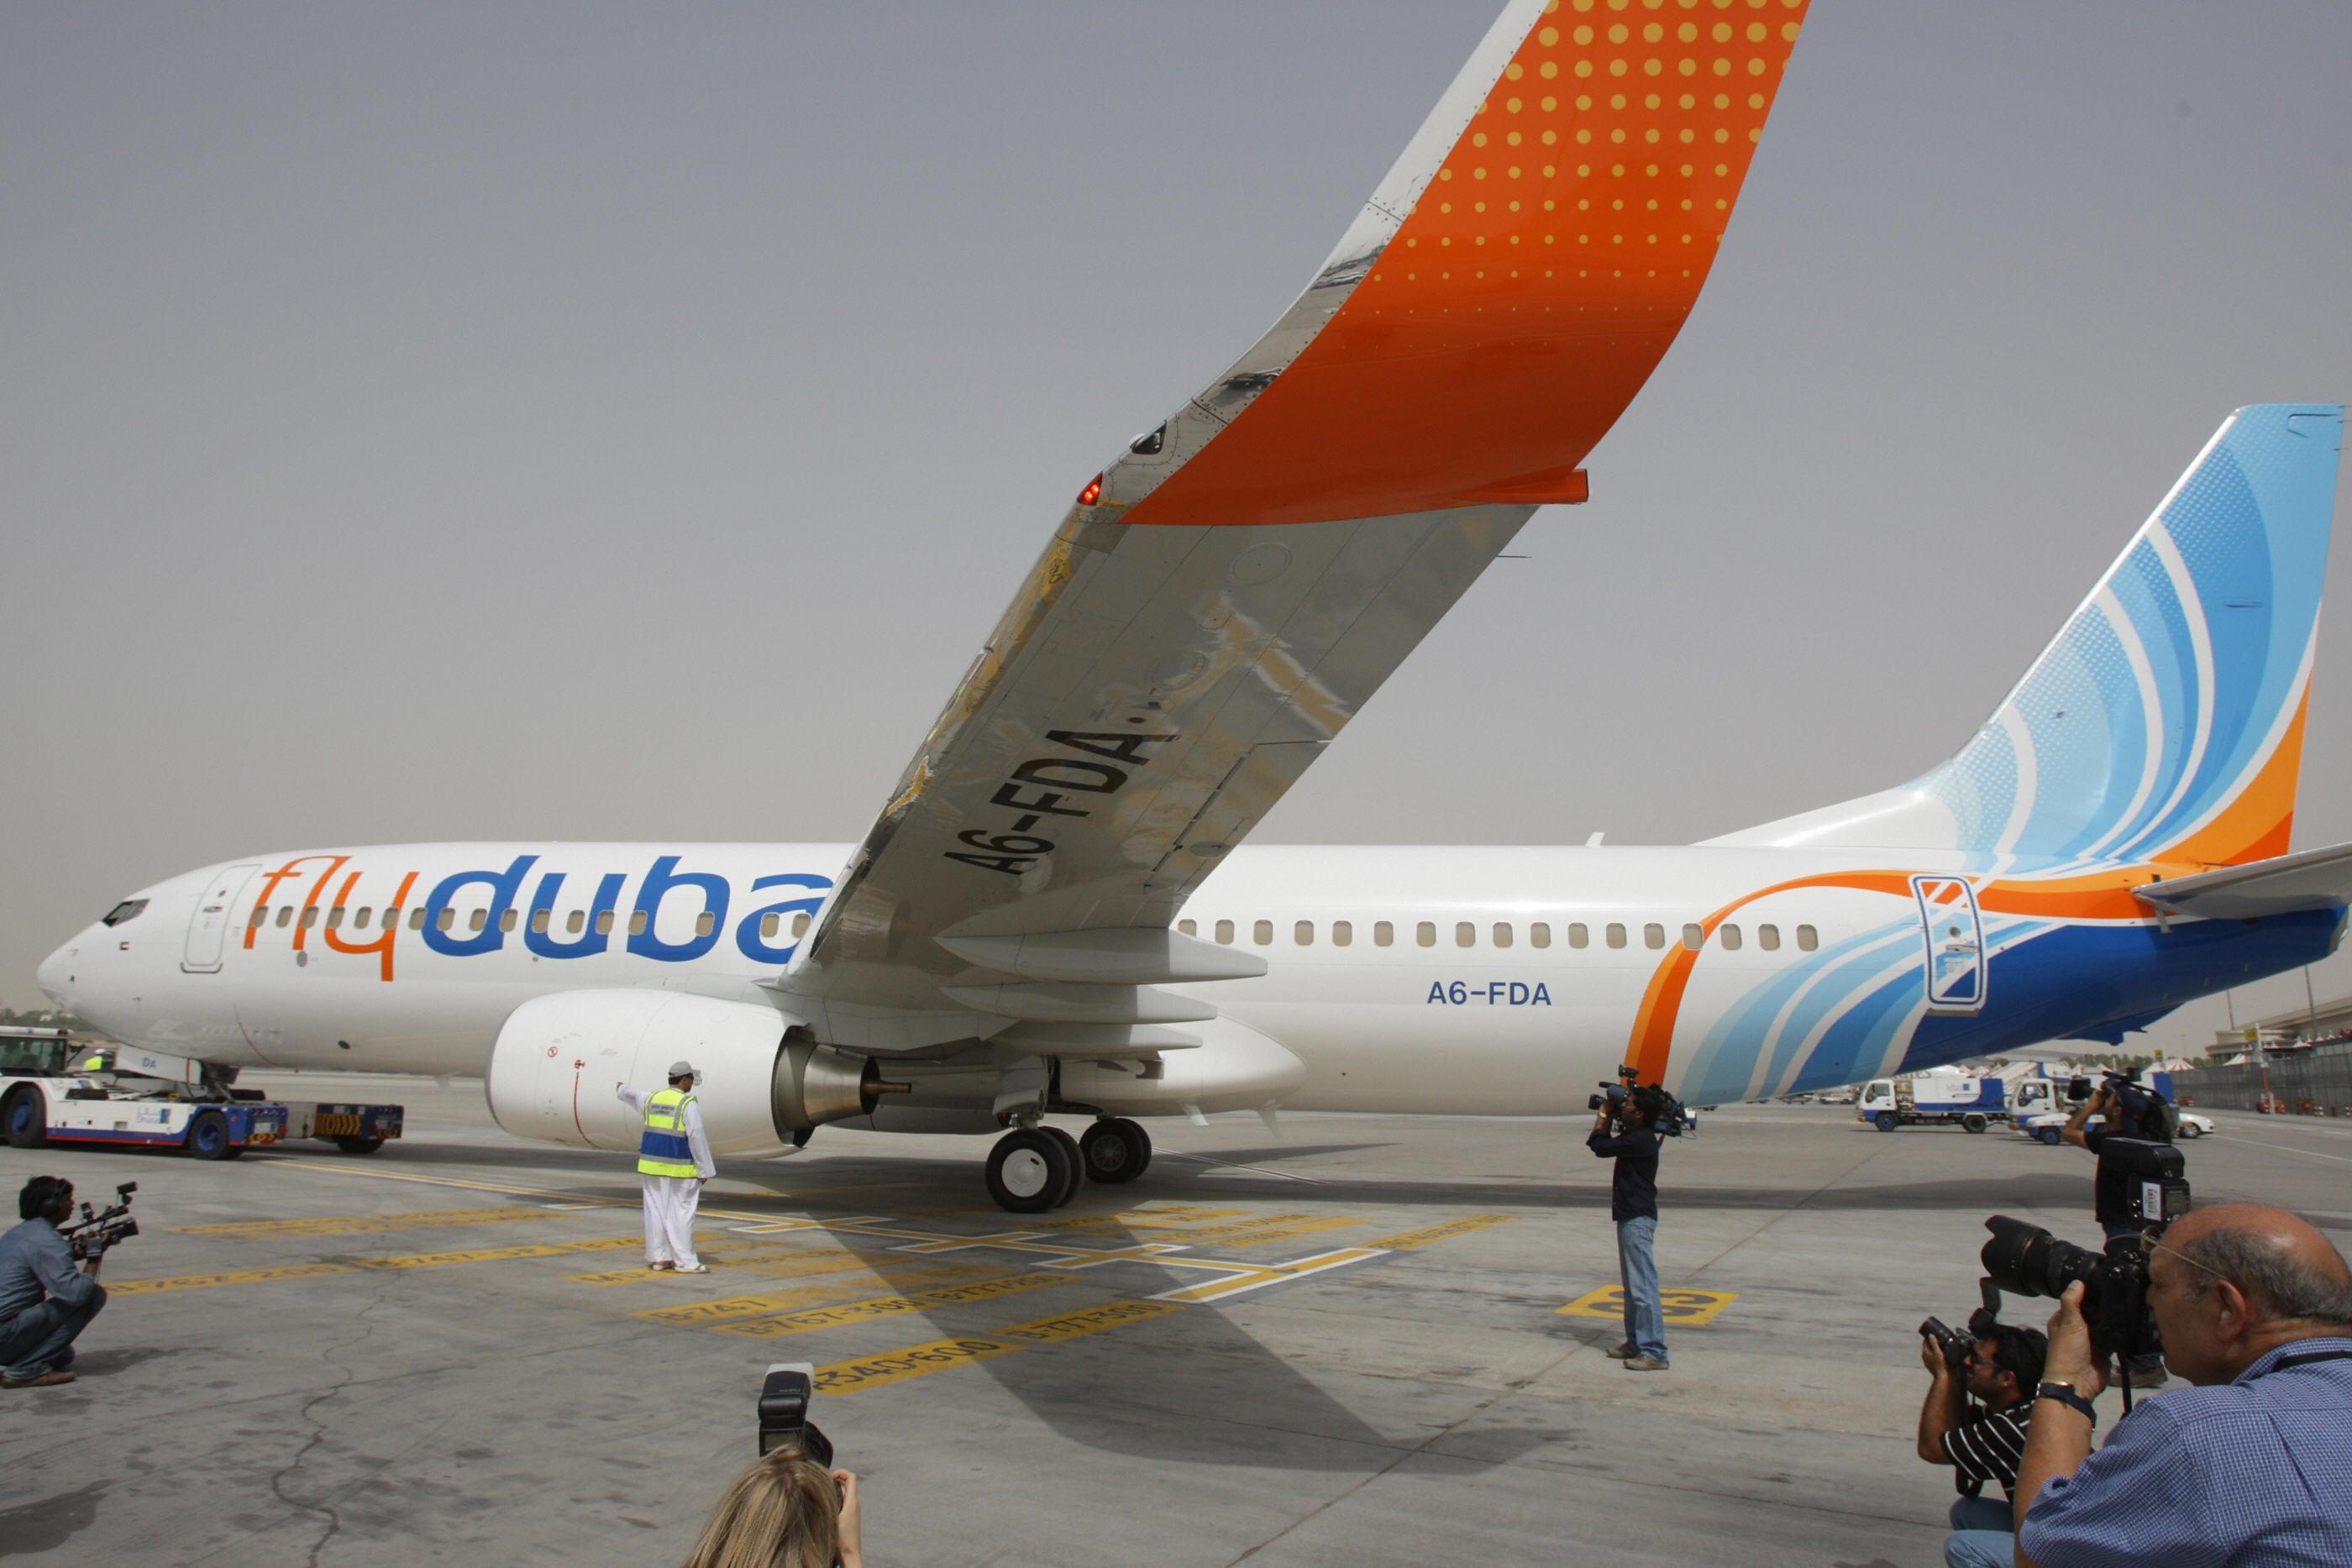 FlyDubai pilots complain of 'dangerous' workloads in leaked documents